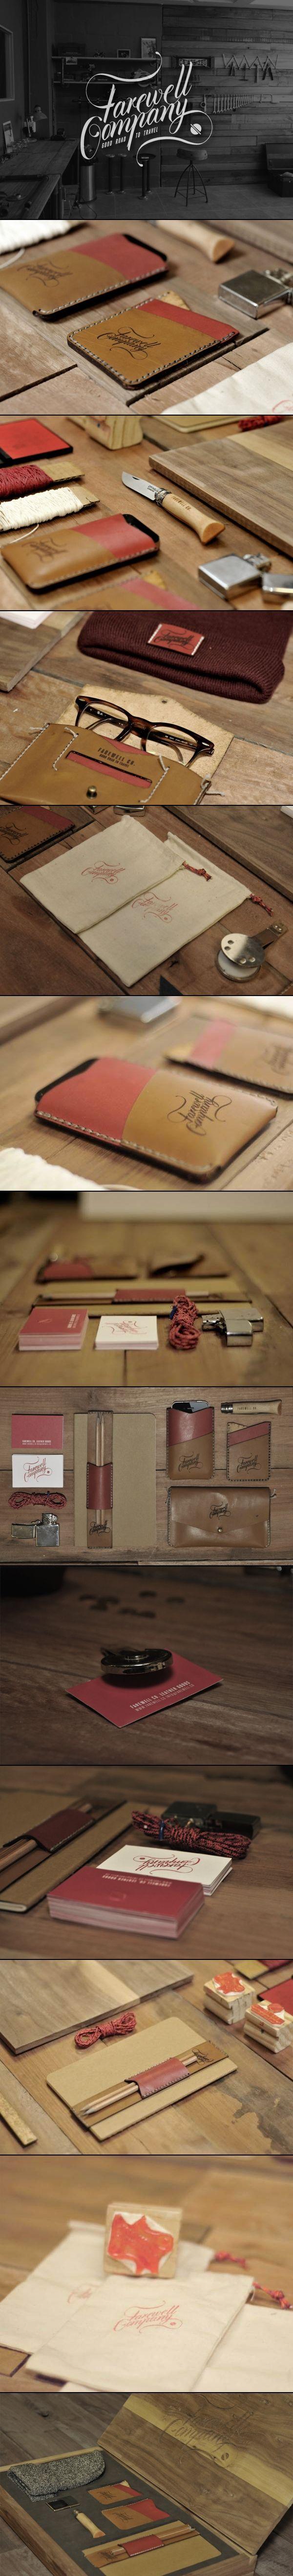 Farewell Co.   stationary corporate design branding marketing   Take a look at www.LogoGestaltung-Hamburg.de